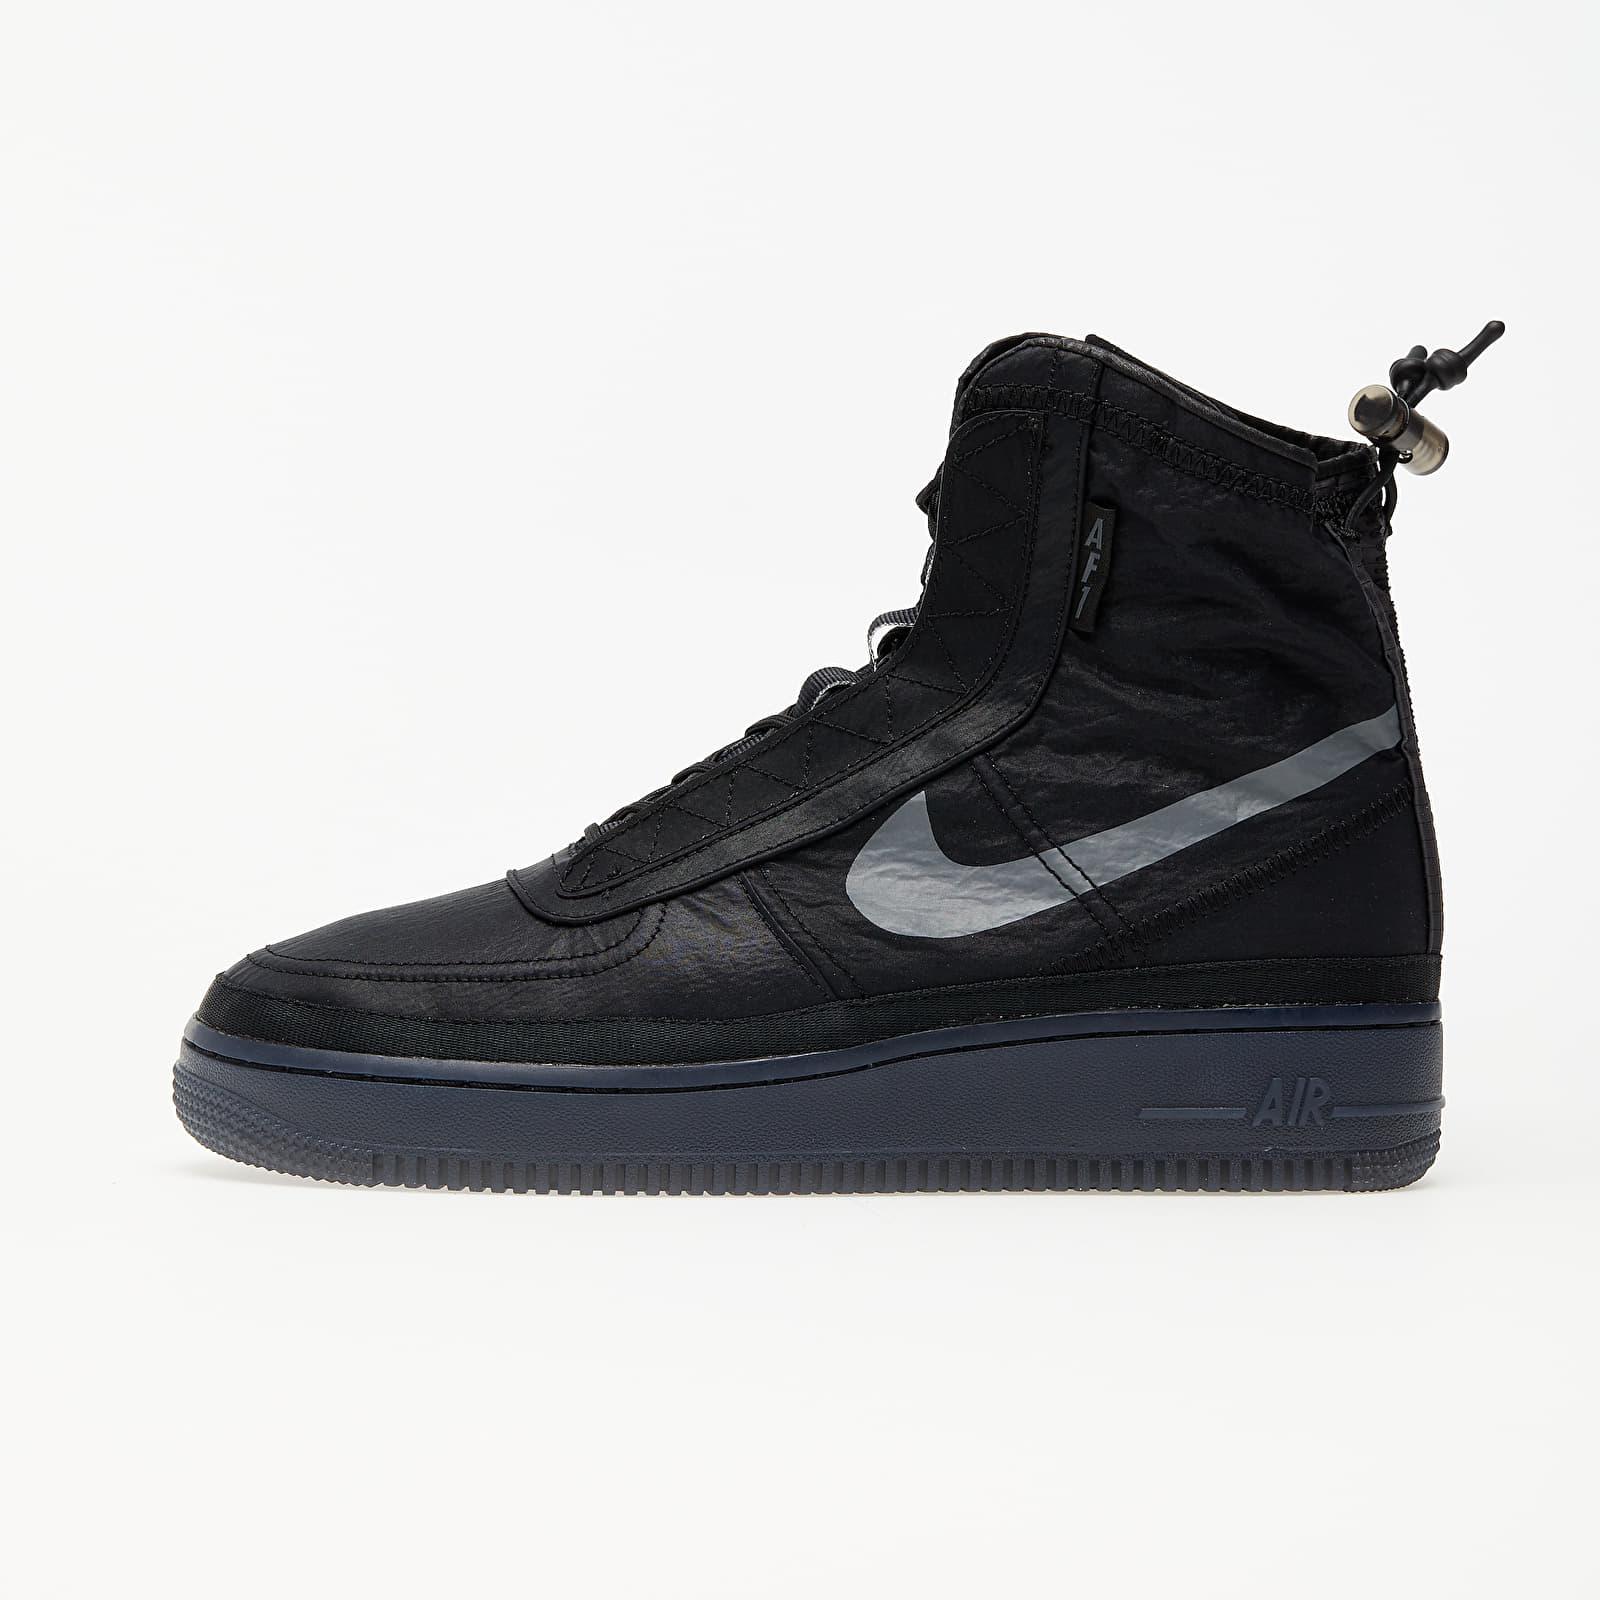 Women's shoes Nike W Air Force 1 Shell Black/ Dark Grey-Black